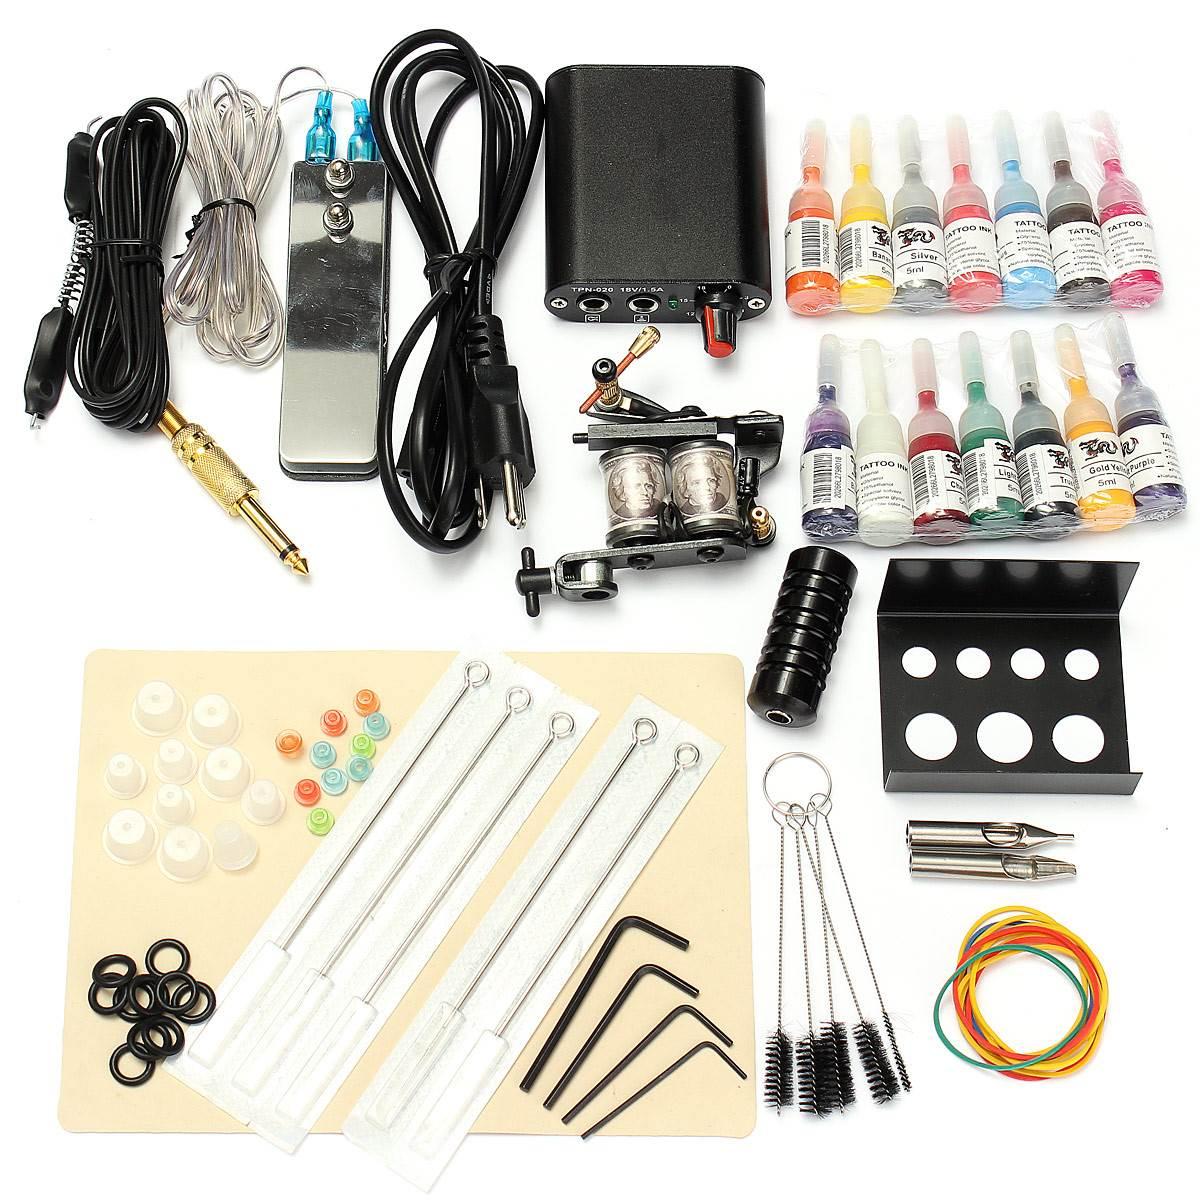 Гаджет  Professional 1 Set 90-264V Complete Equipment Tattoo Machine Gun 14 Color Inks Power Supply Cord Kit Body Beauty DIY Tools None Красота и здоровье